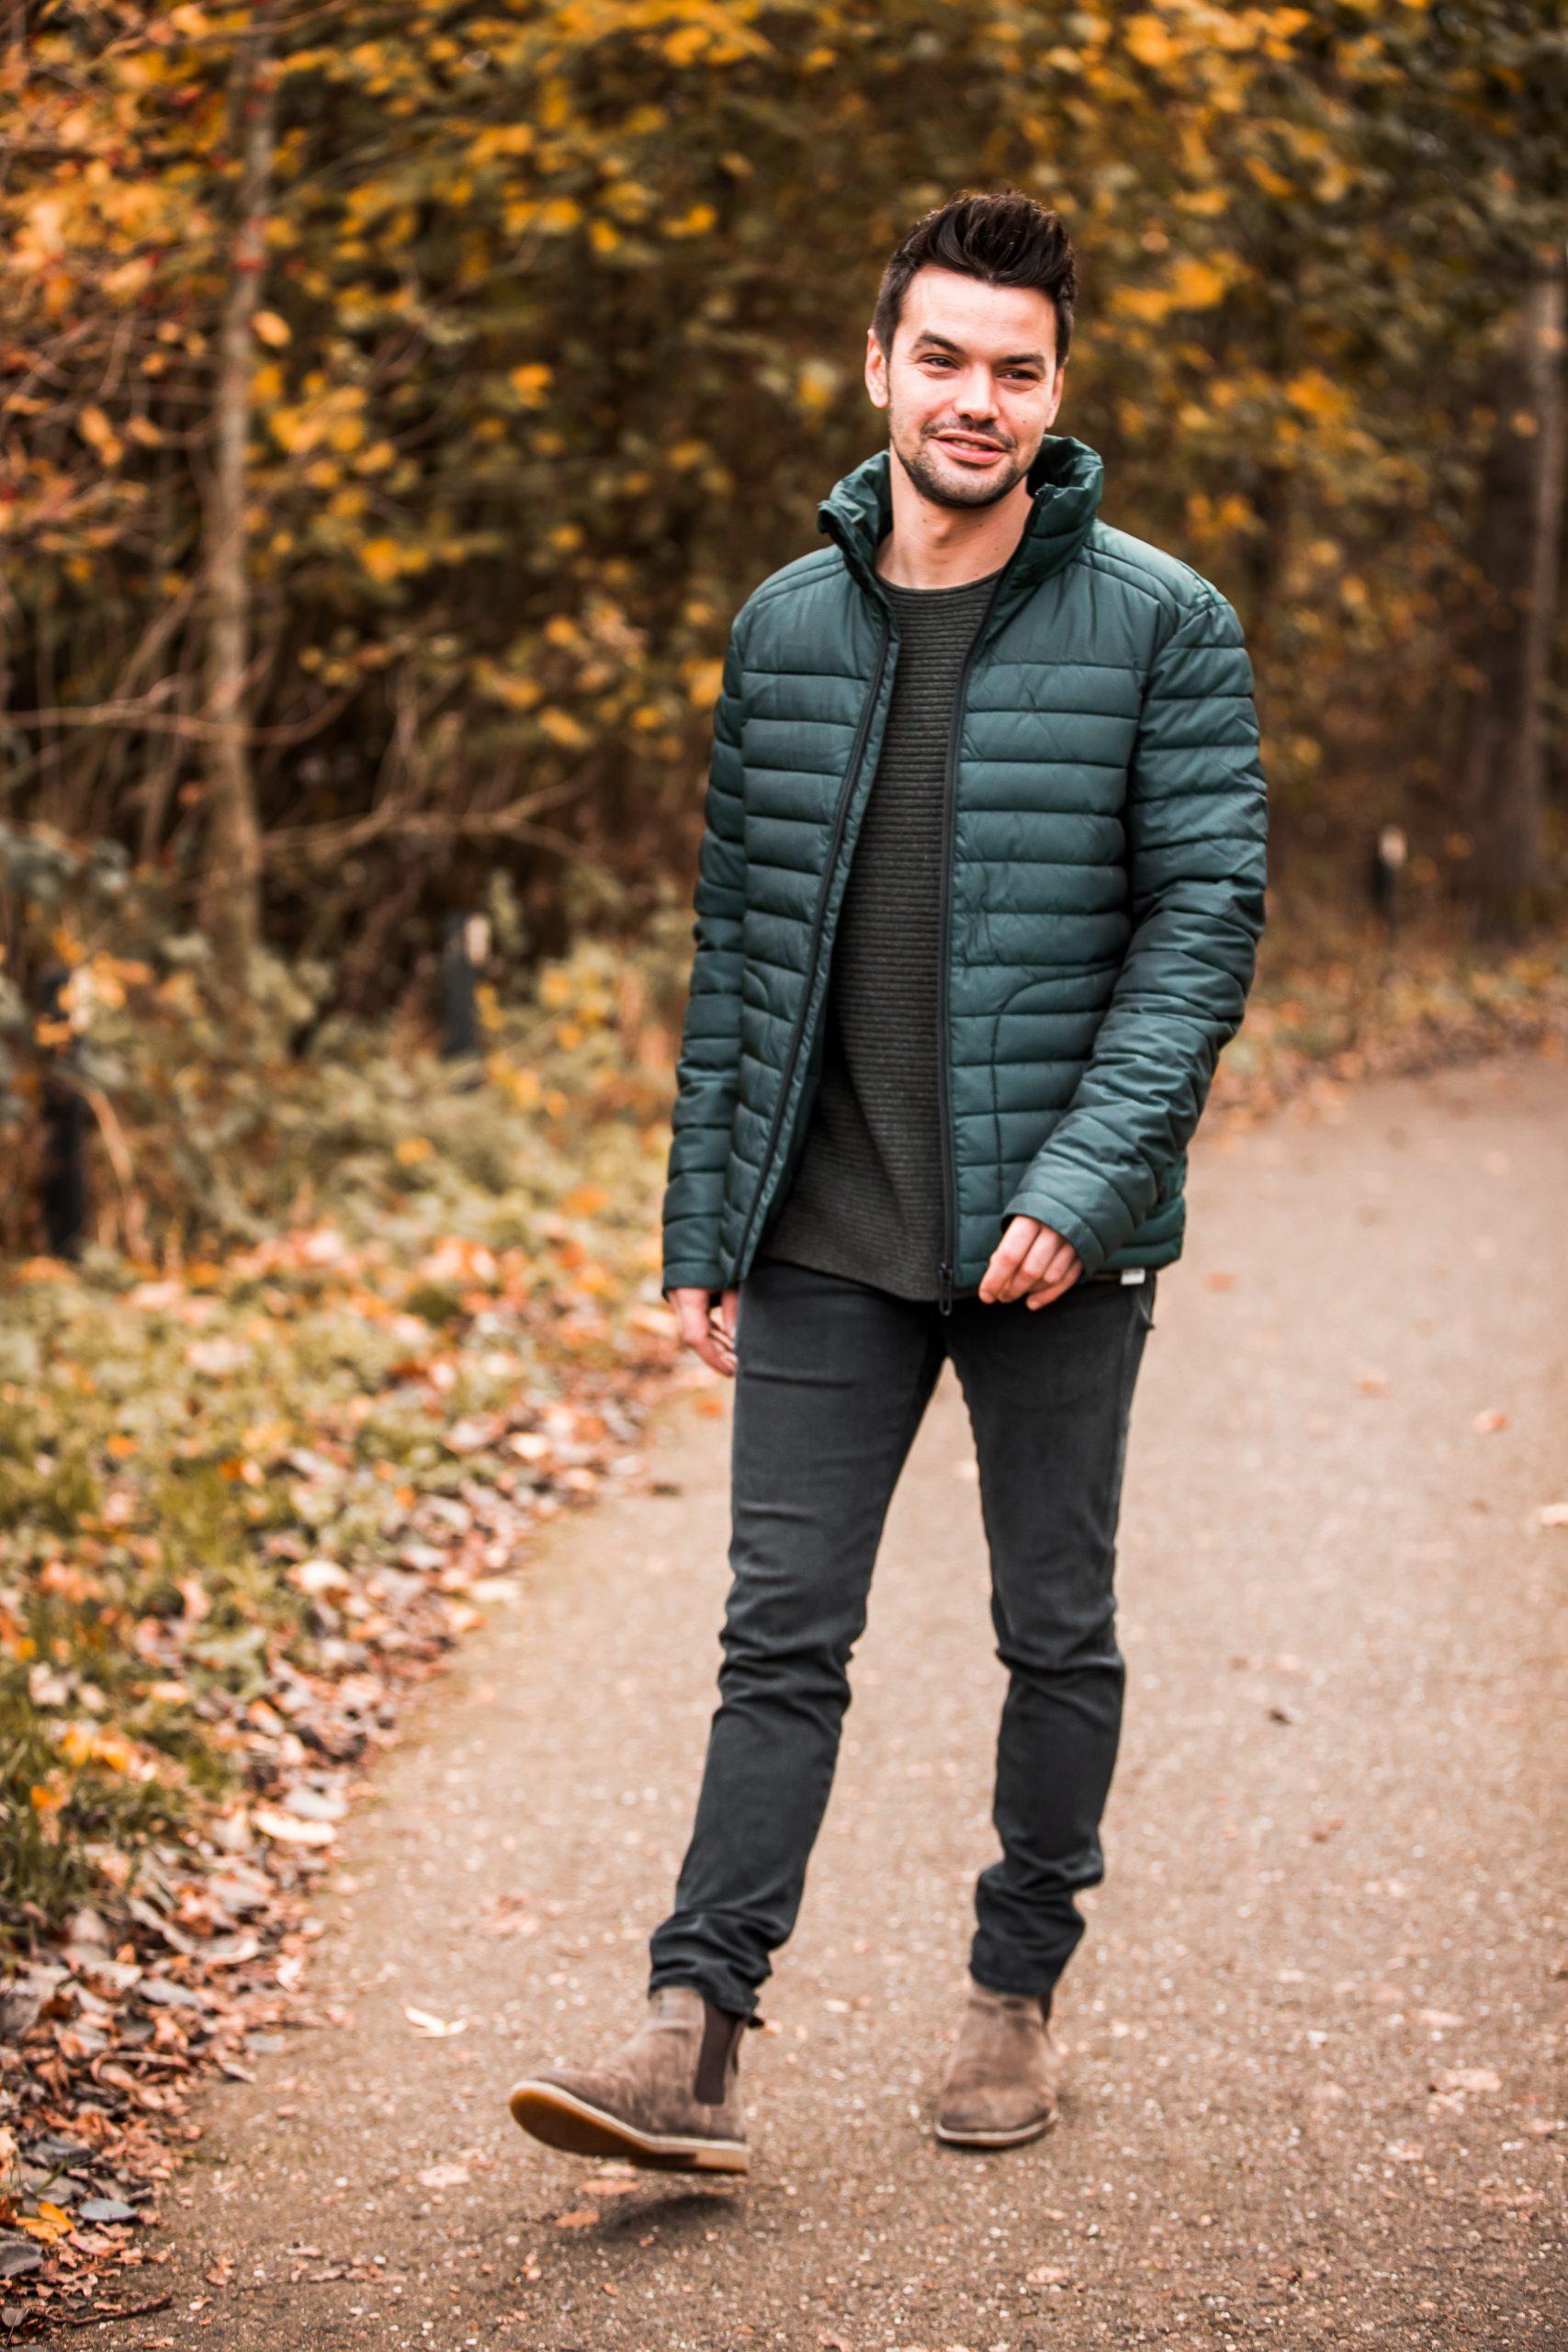 jas, winterjas, plutosport, superdry, dikke jas, warme jas, lange jas, mannen jas, dames jas, winter, herfst